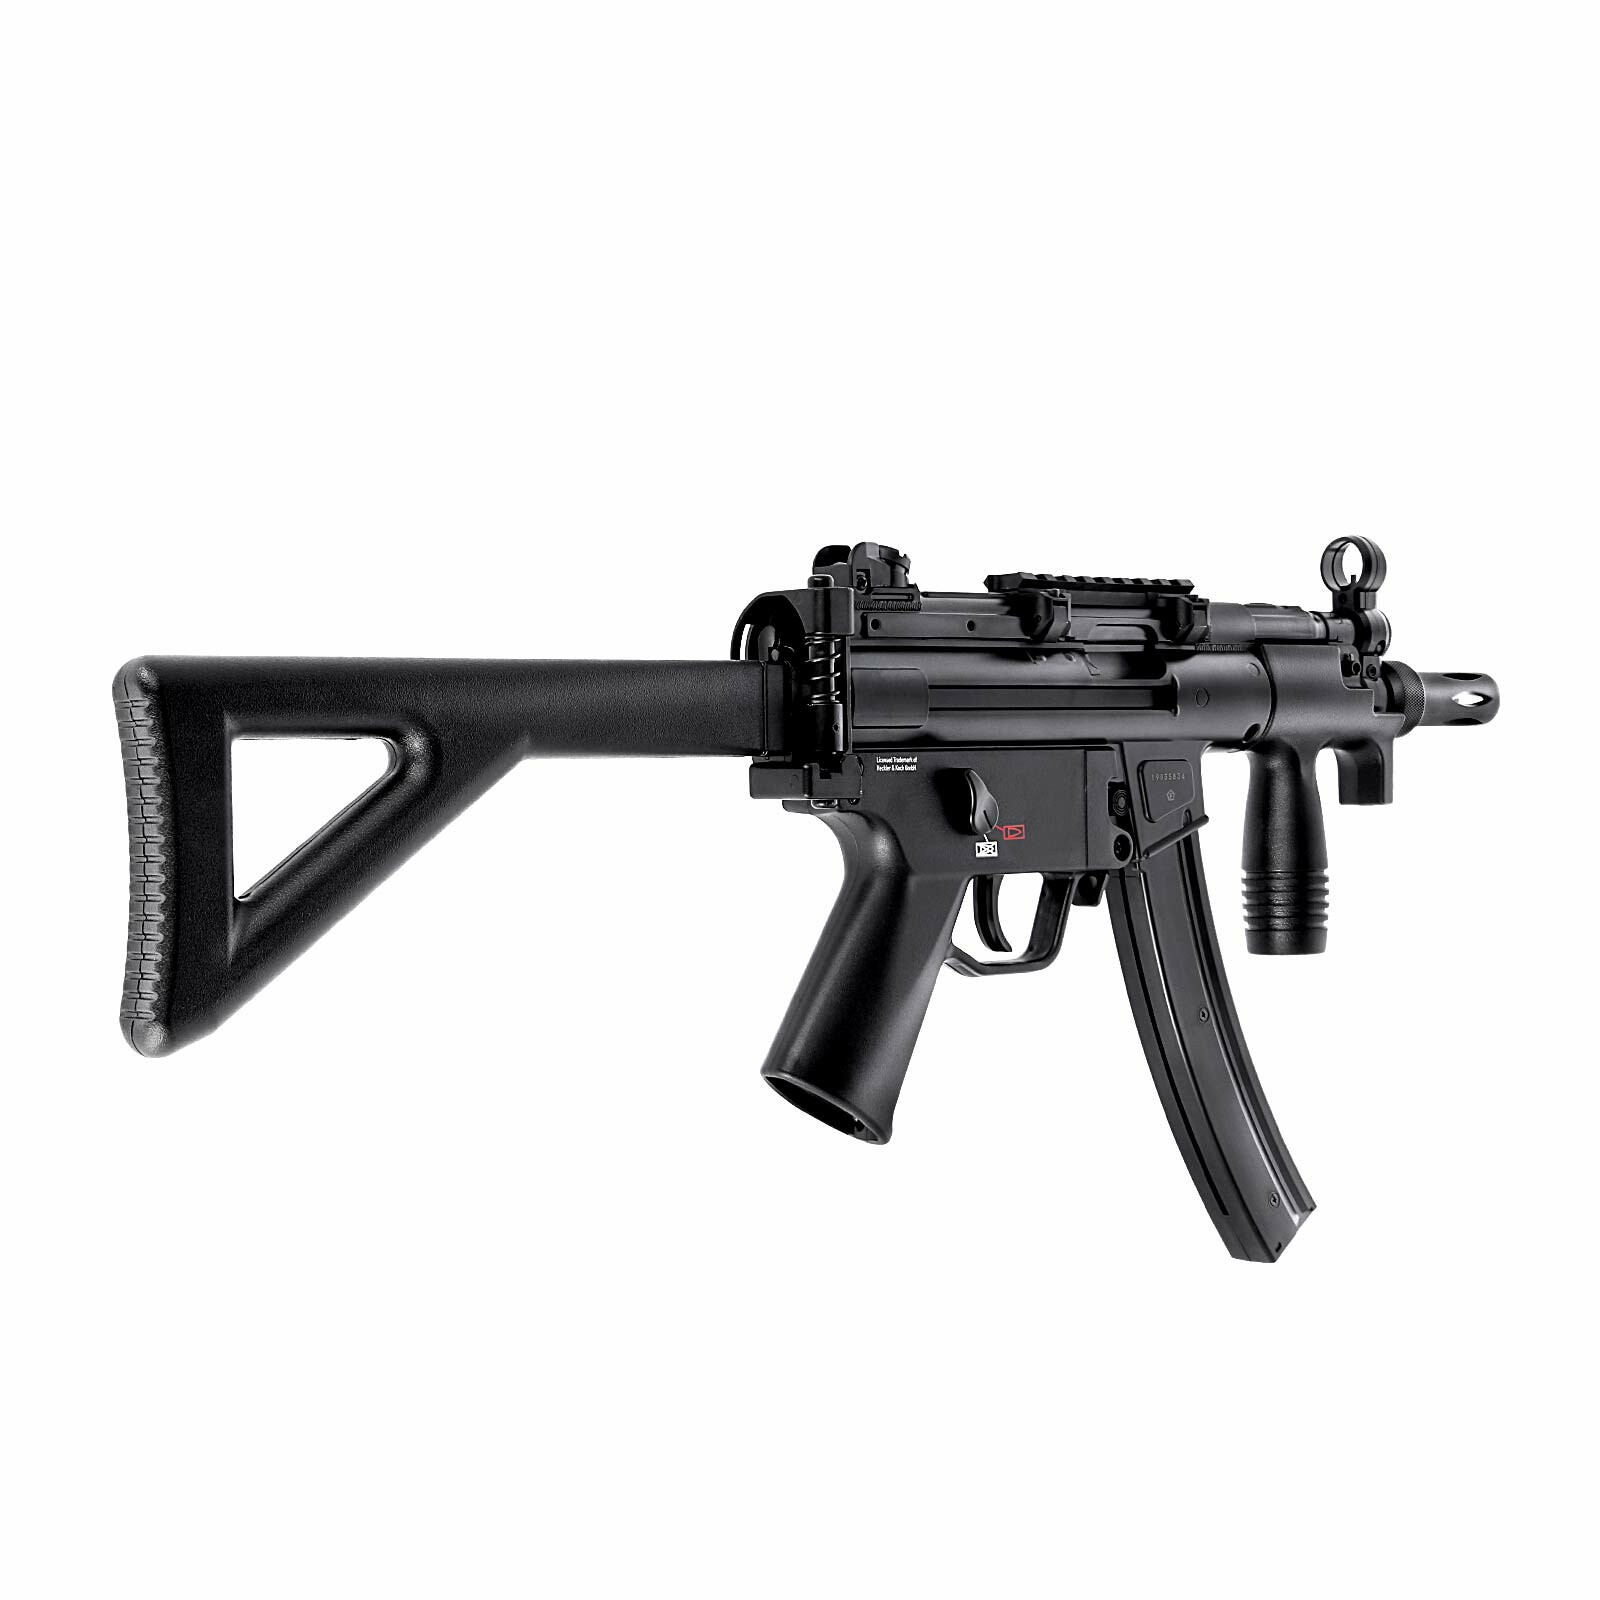 Heckler & Koch MP5 K-PDW Co2 Kaliber 4.5 Mm Stahl BB